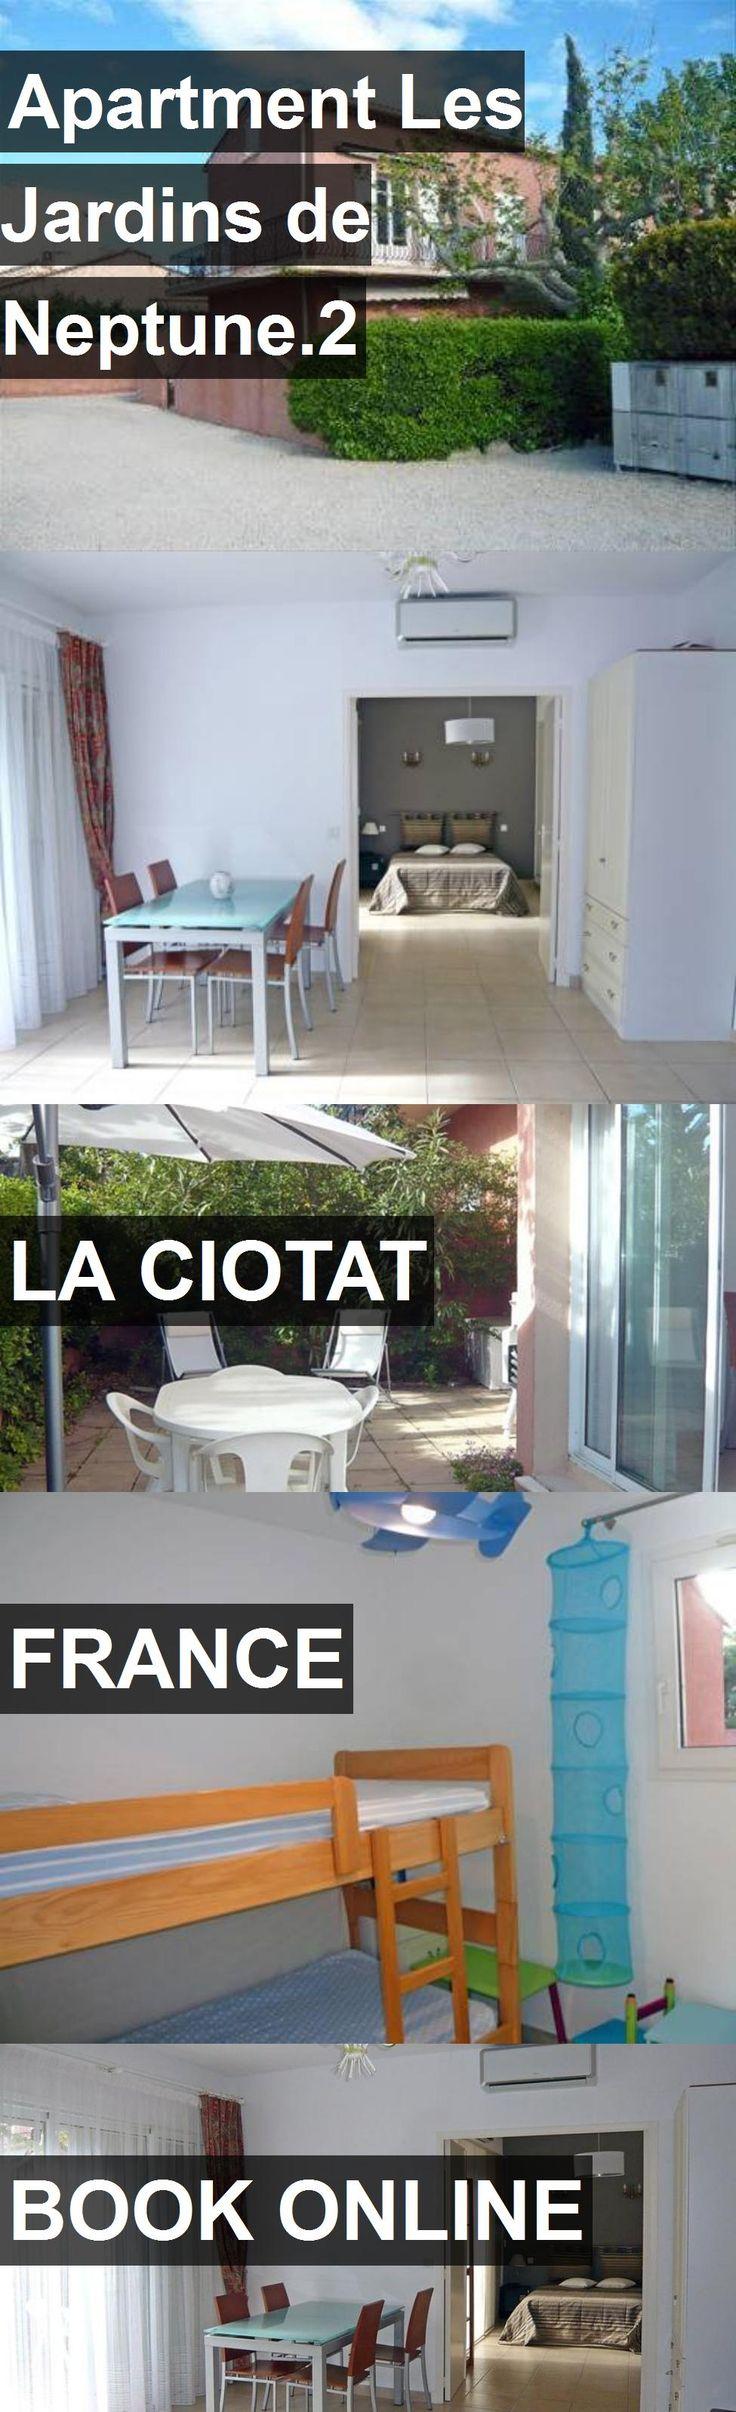 Apartment Les Jardins de Neptune.2 in La Ciotat, France. For more information, photos, reviews and best prices please follow the link. #France #LaCiotat #travel #vacation #apartment